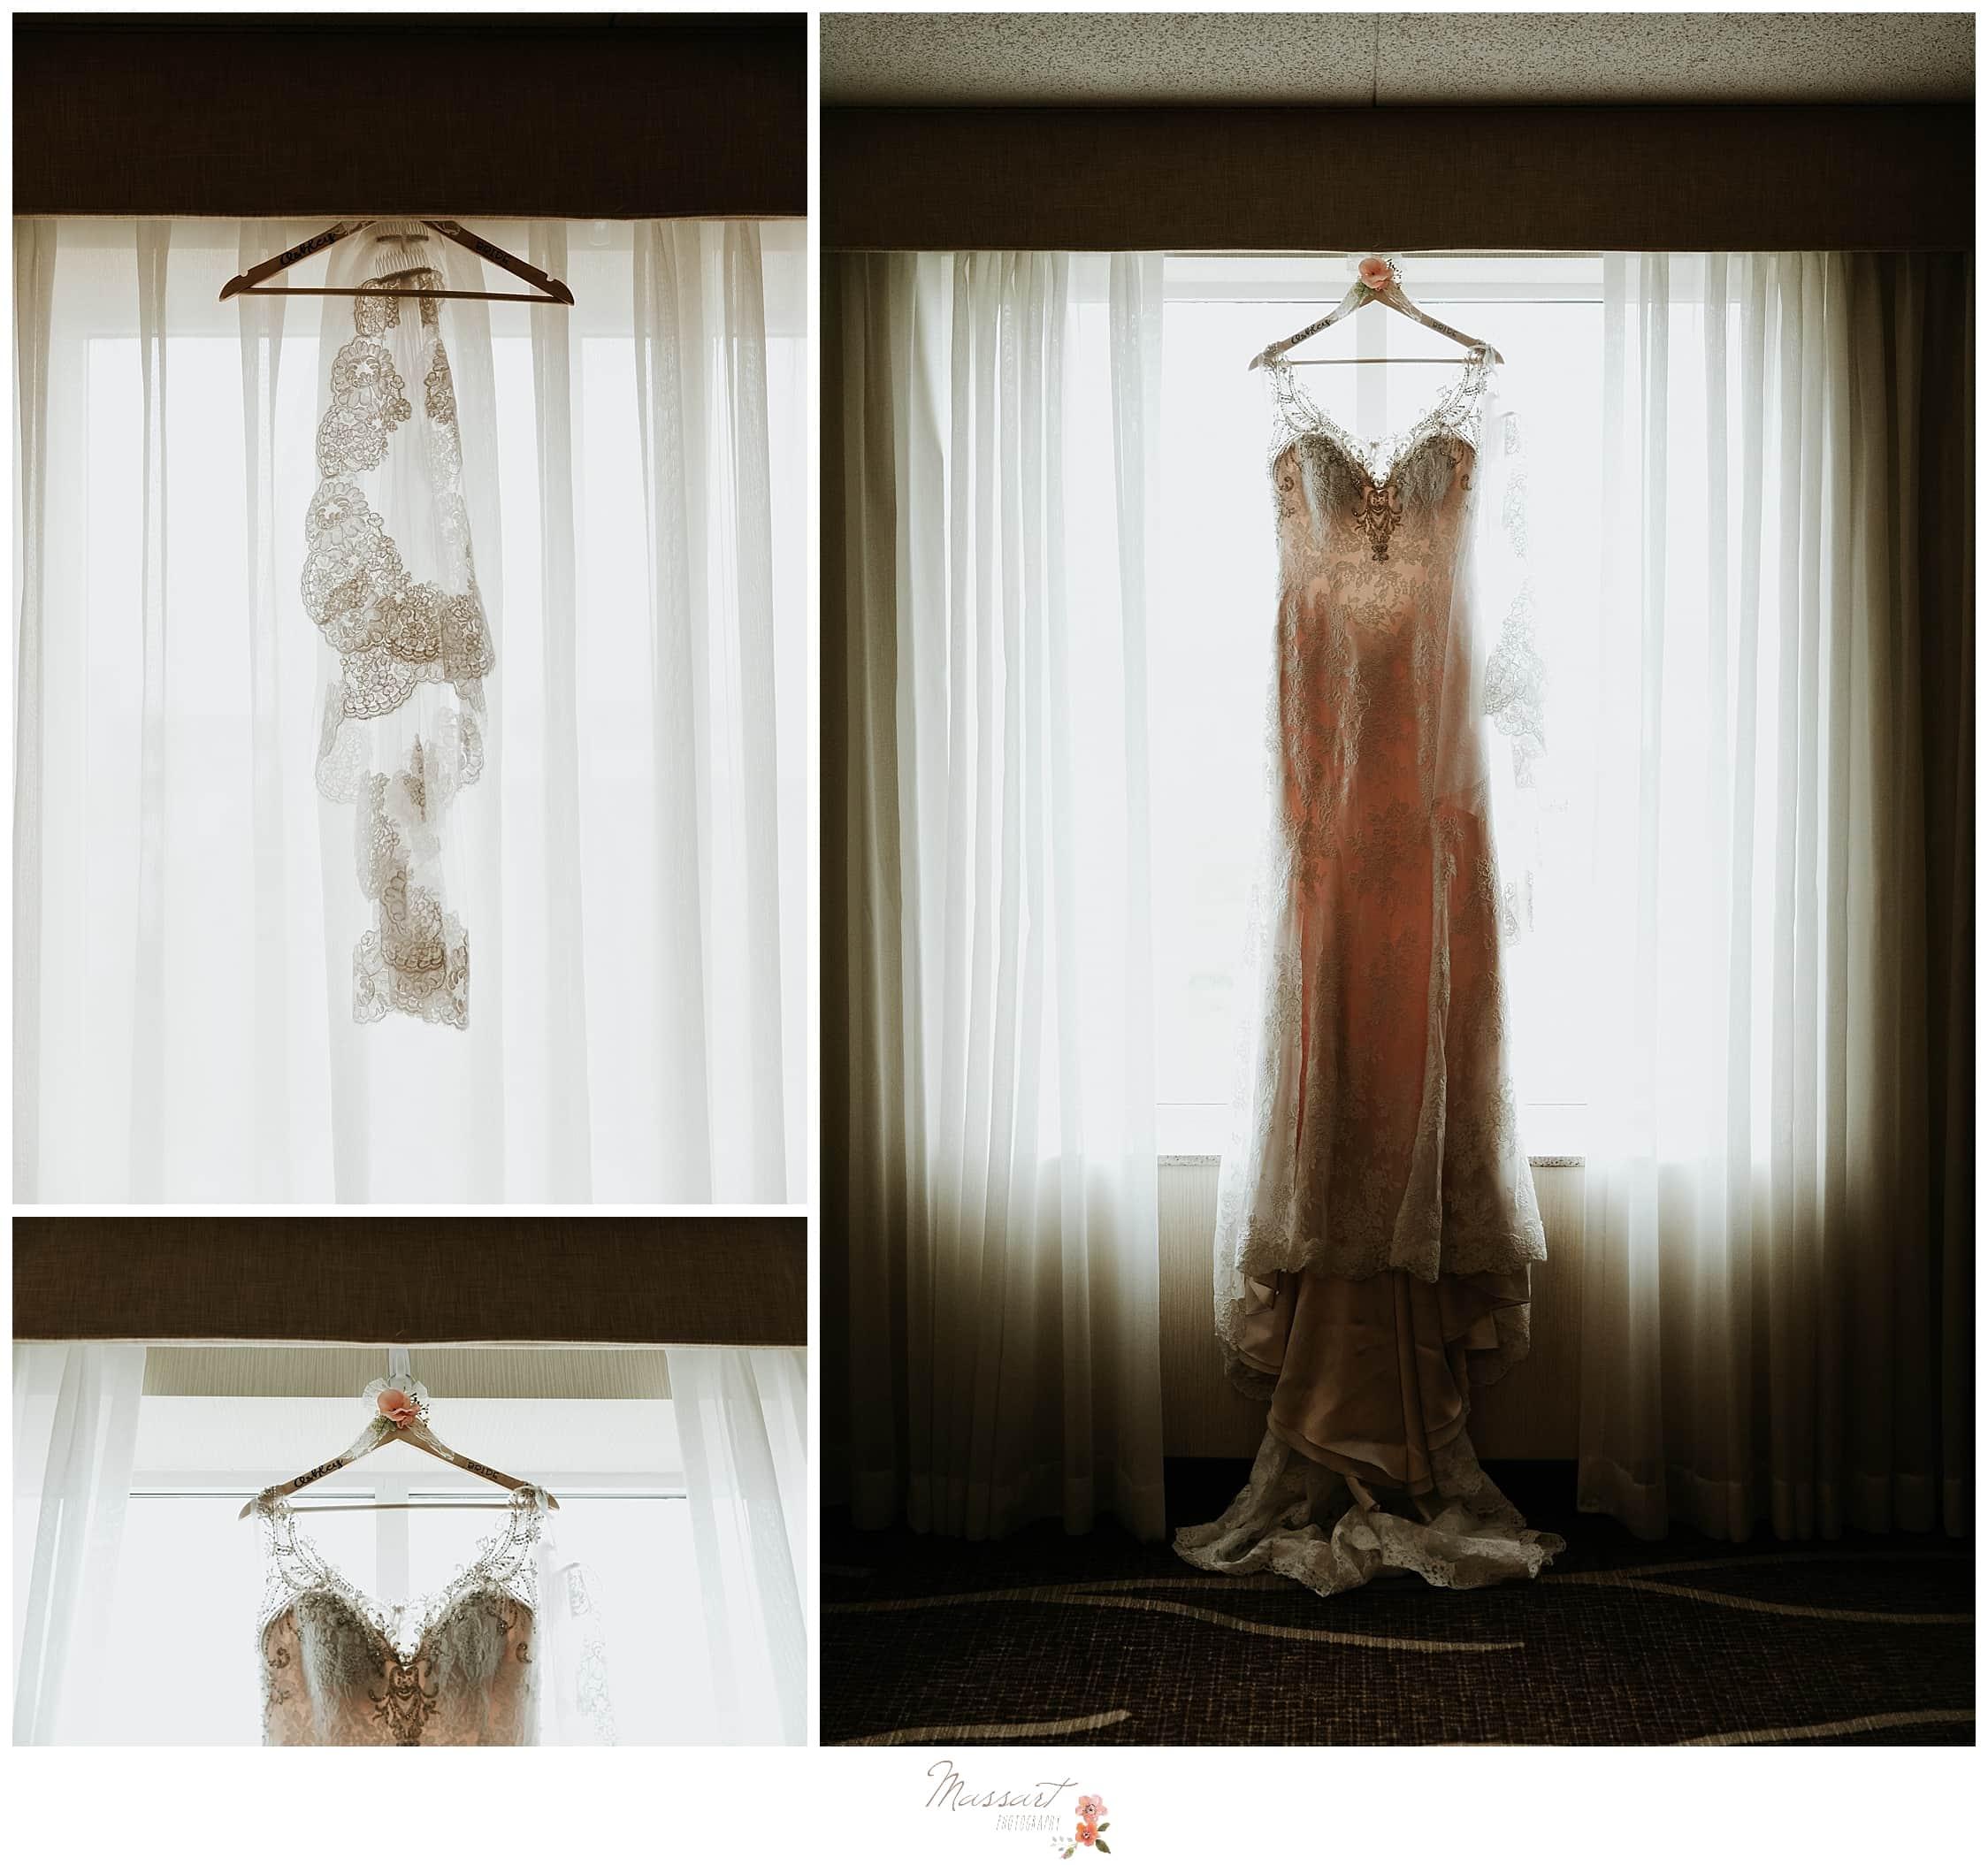 Stunning ivory and lace wedding dress photographed by RI, MA and CT photographers Massart Photography.